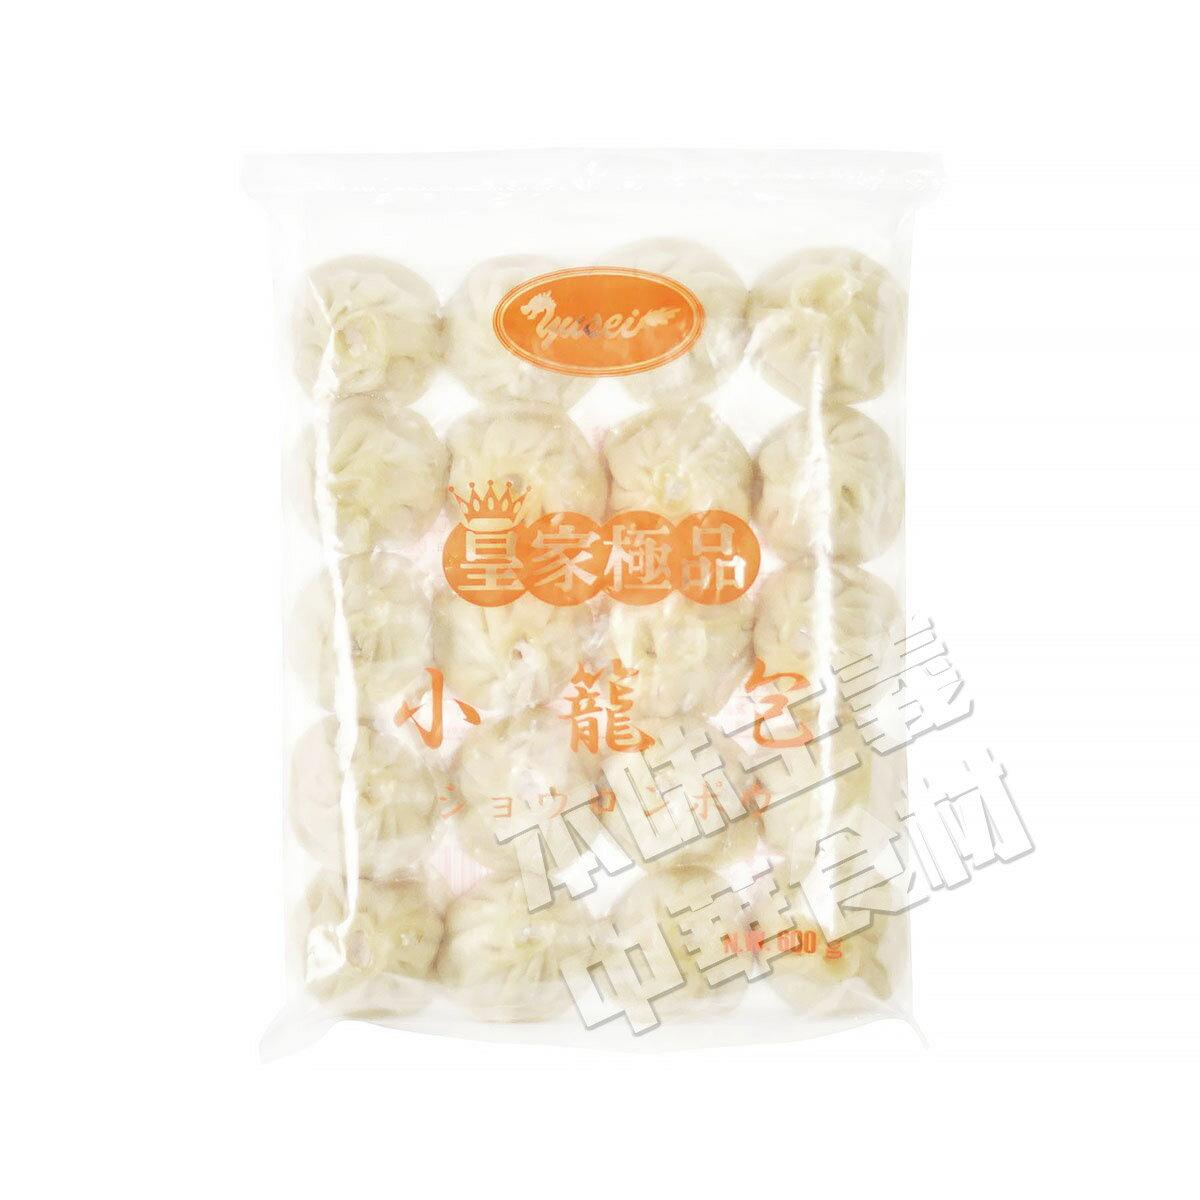 友盛皇家極品小籠包(ショーロンポー)中華料理人気商品・中国名物・定番お土産